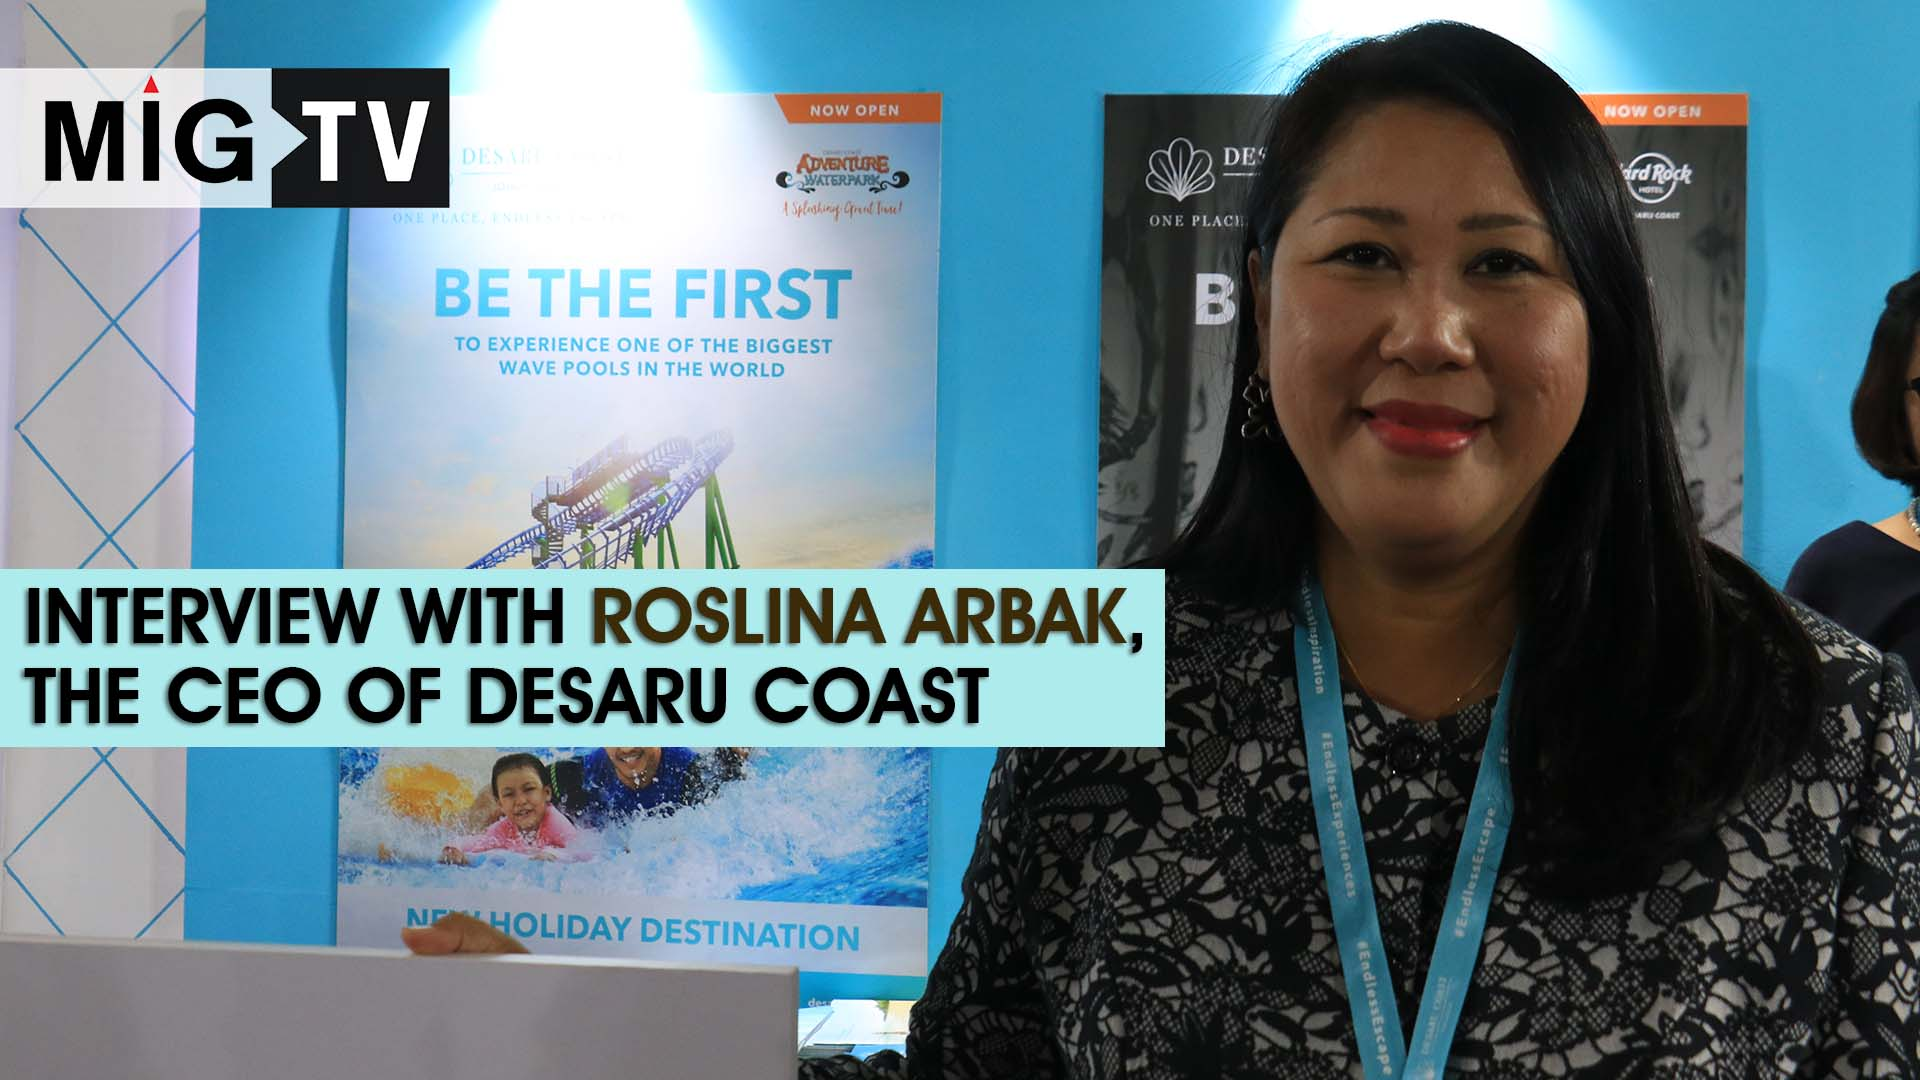 Interview with Roslina Arbak, the CEO of Desaru Coast